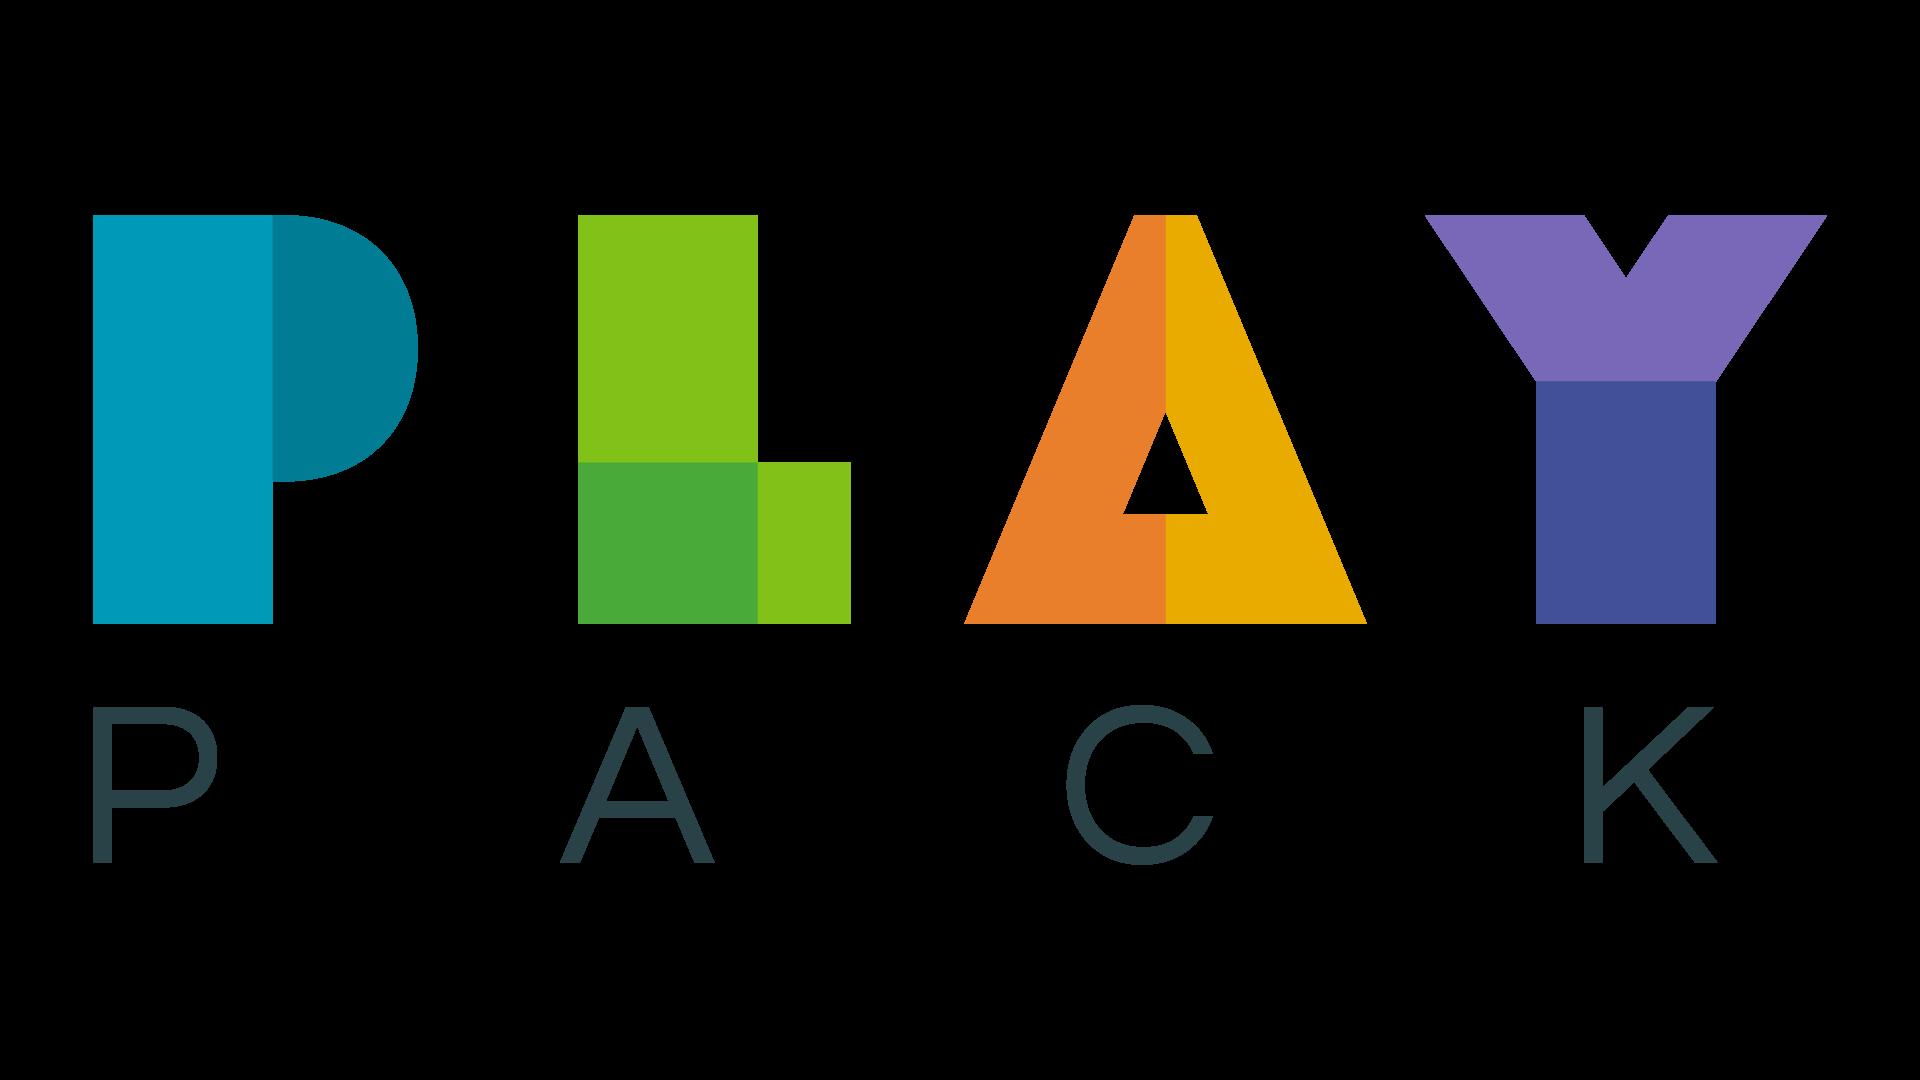 PlayPack Games